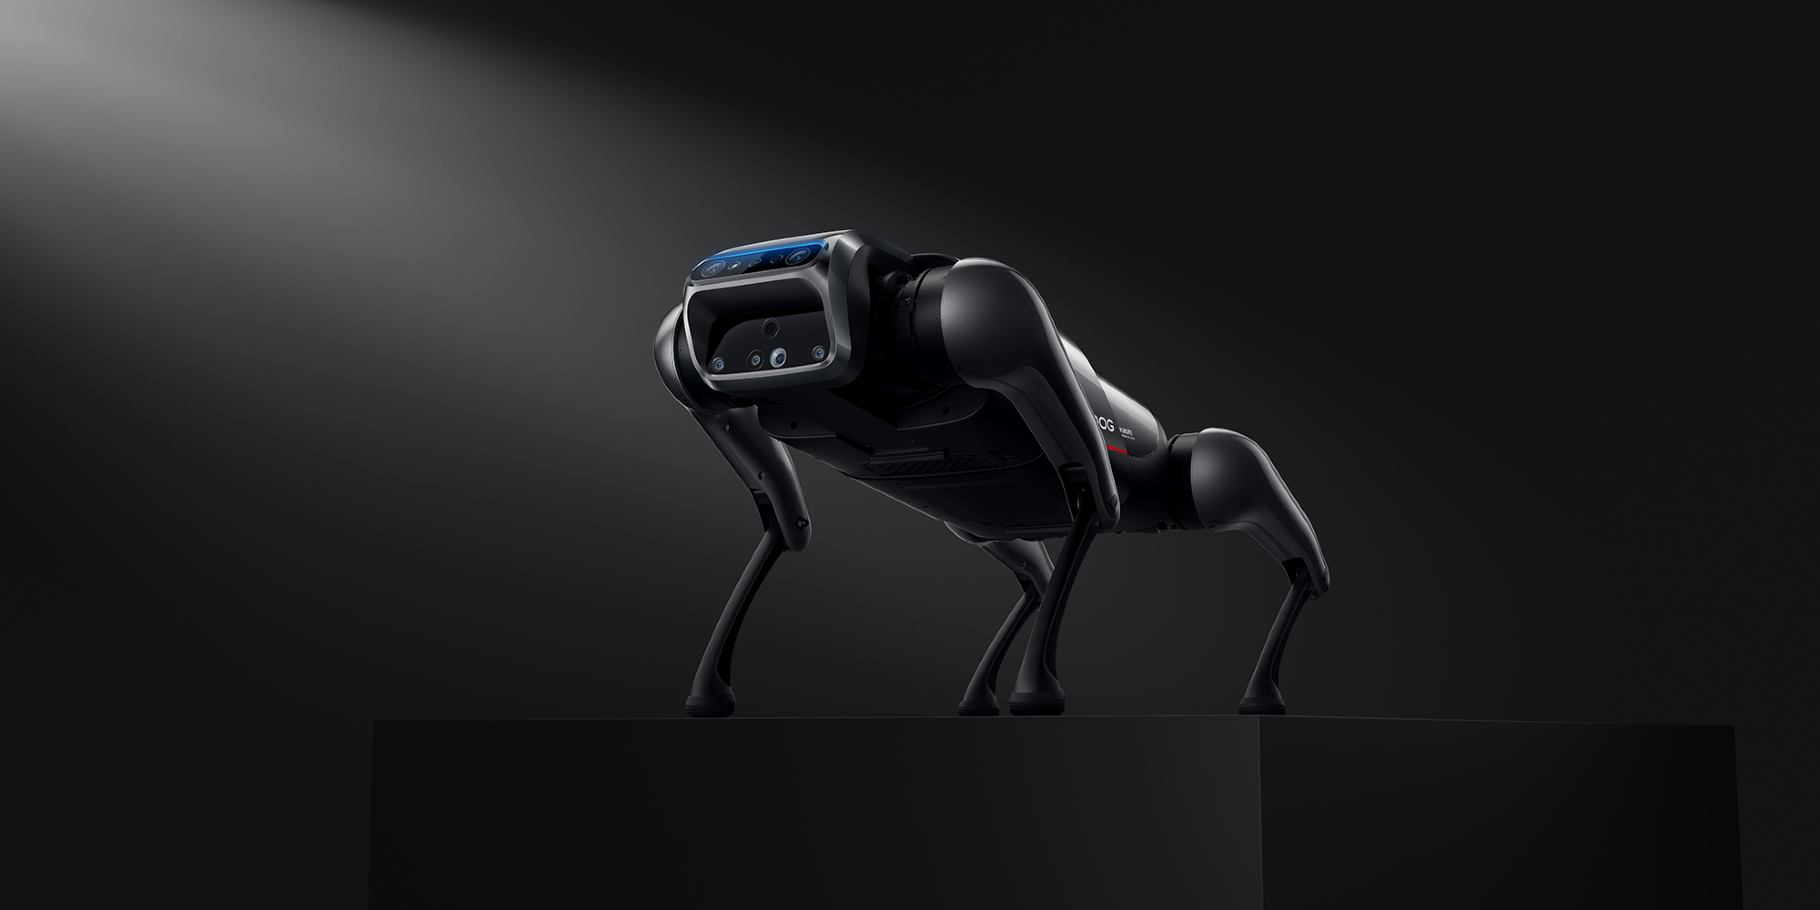 Cyberdog, il robot quadrupede sviluppato da Xiaomi - MeteoWeek.com